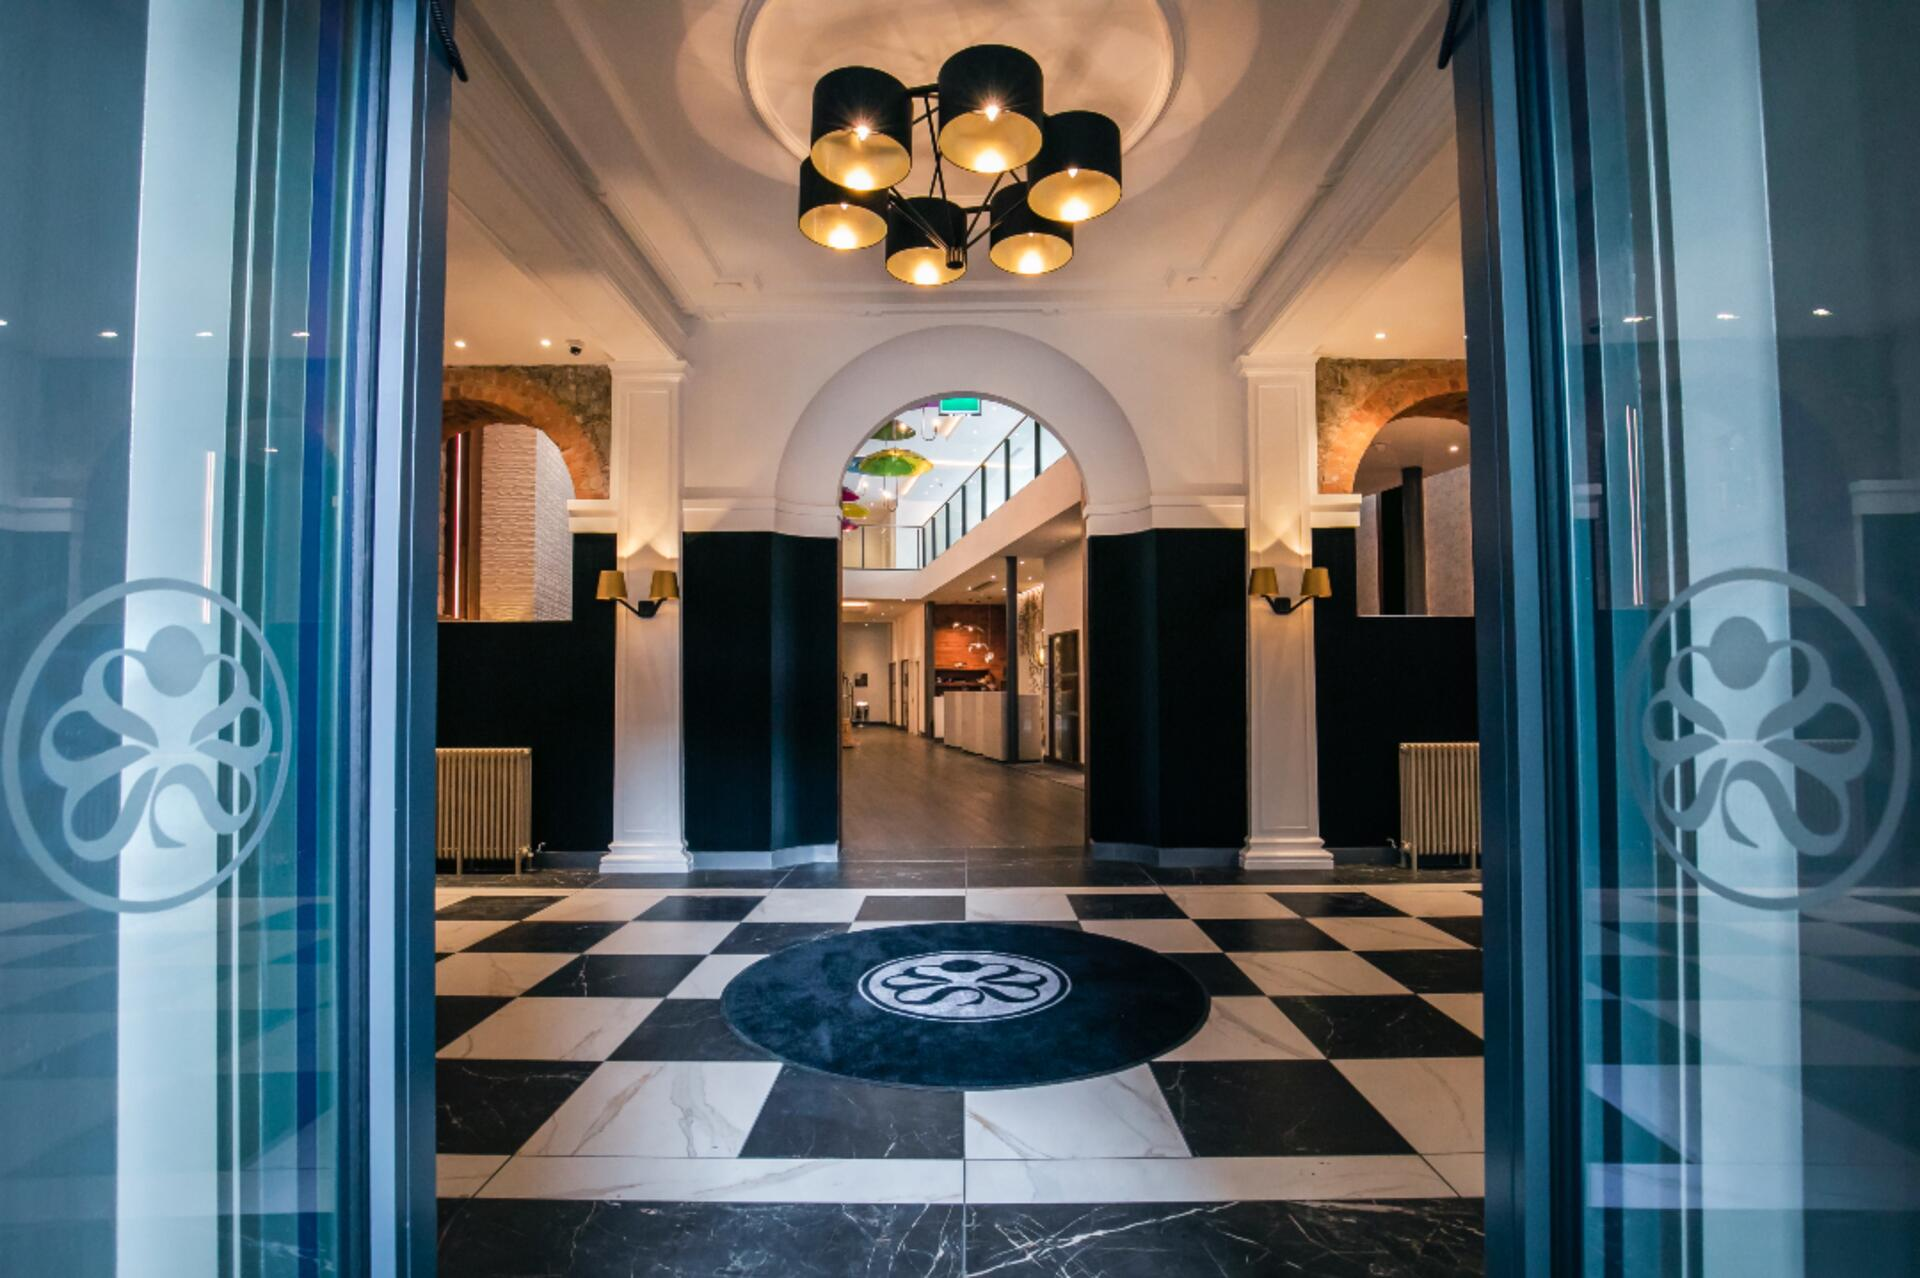 The entrance at Sandman Signature Aberdeen Hotel